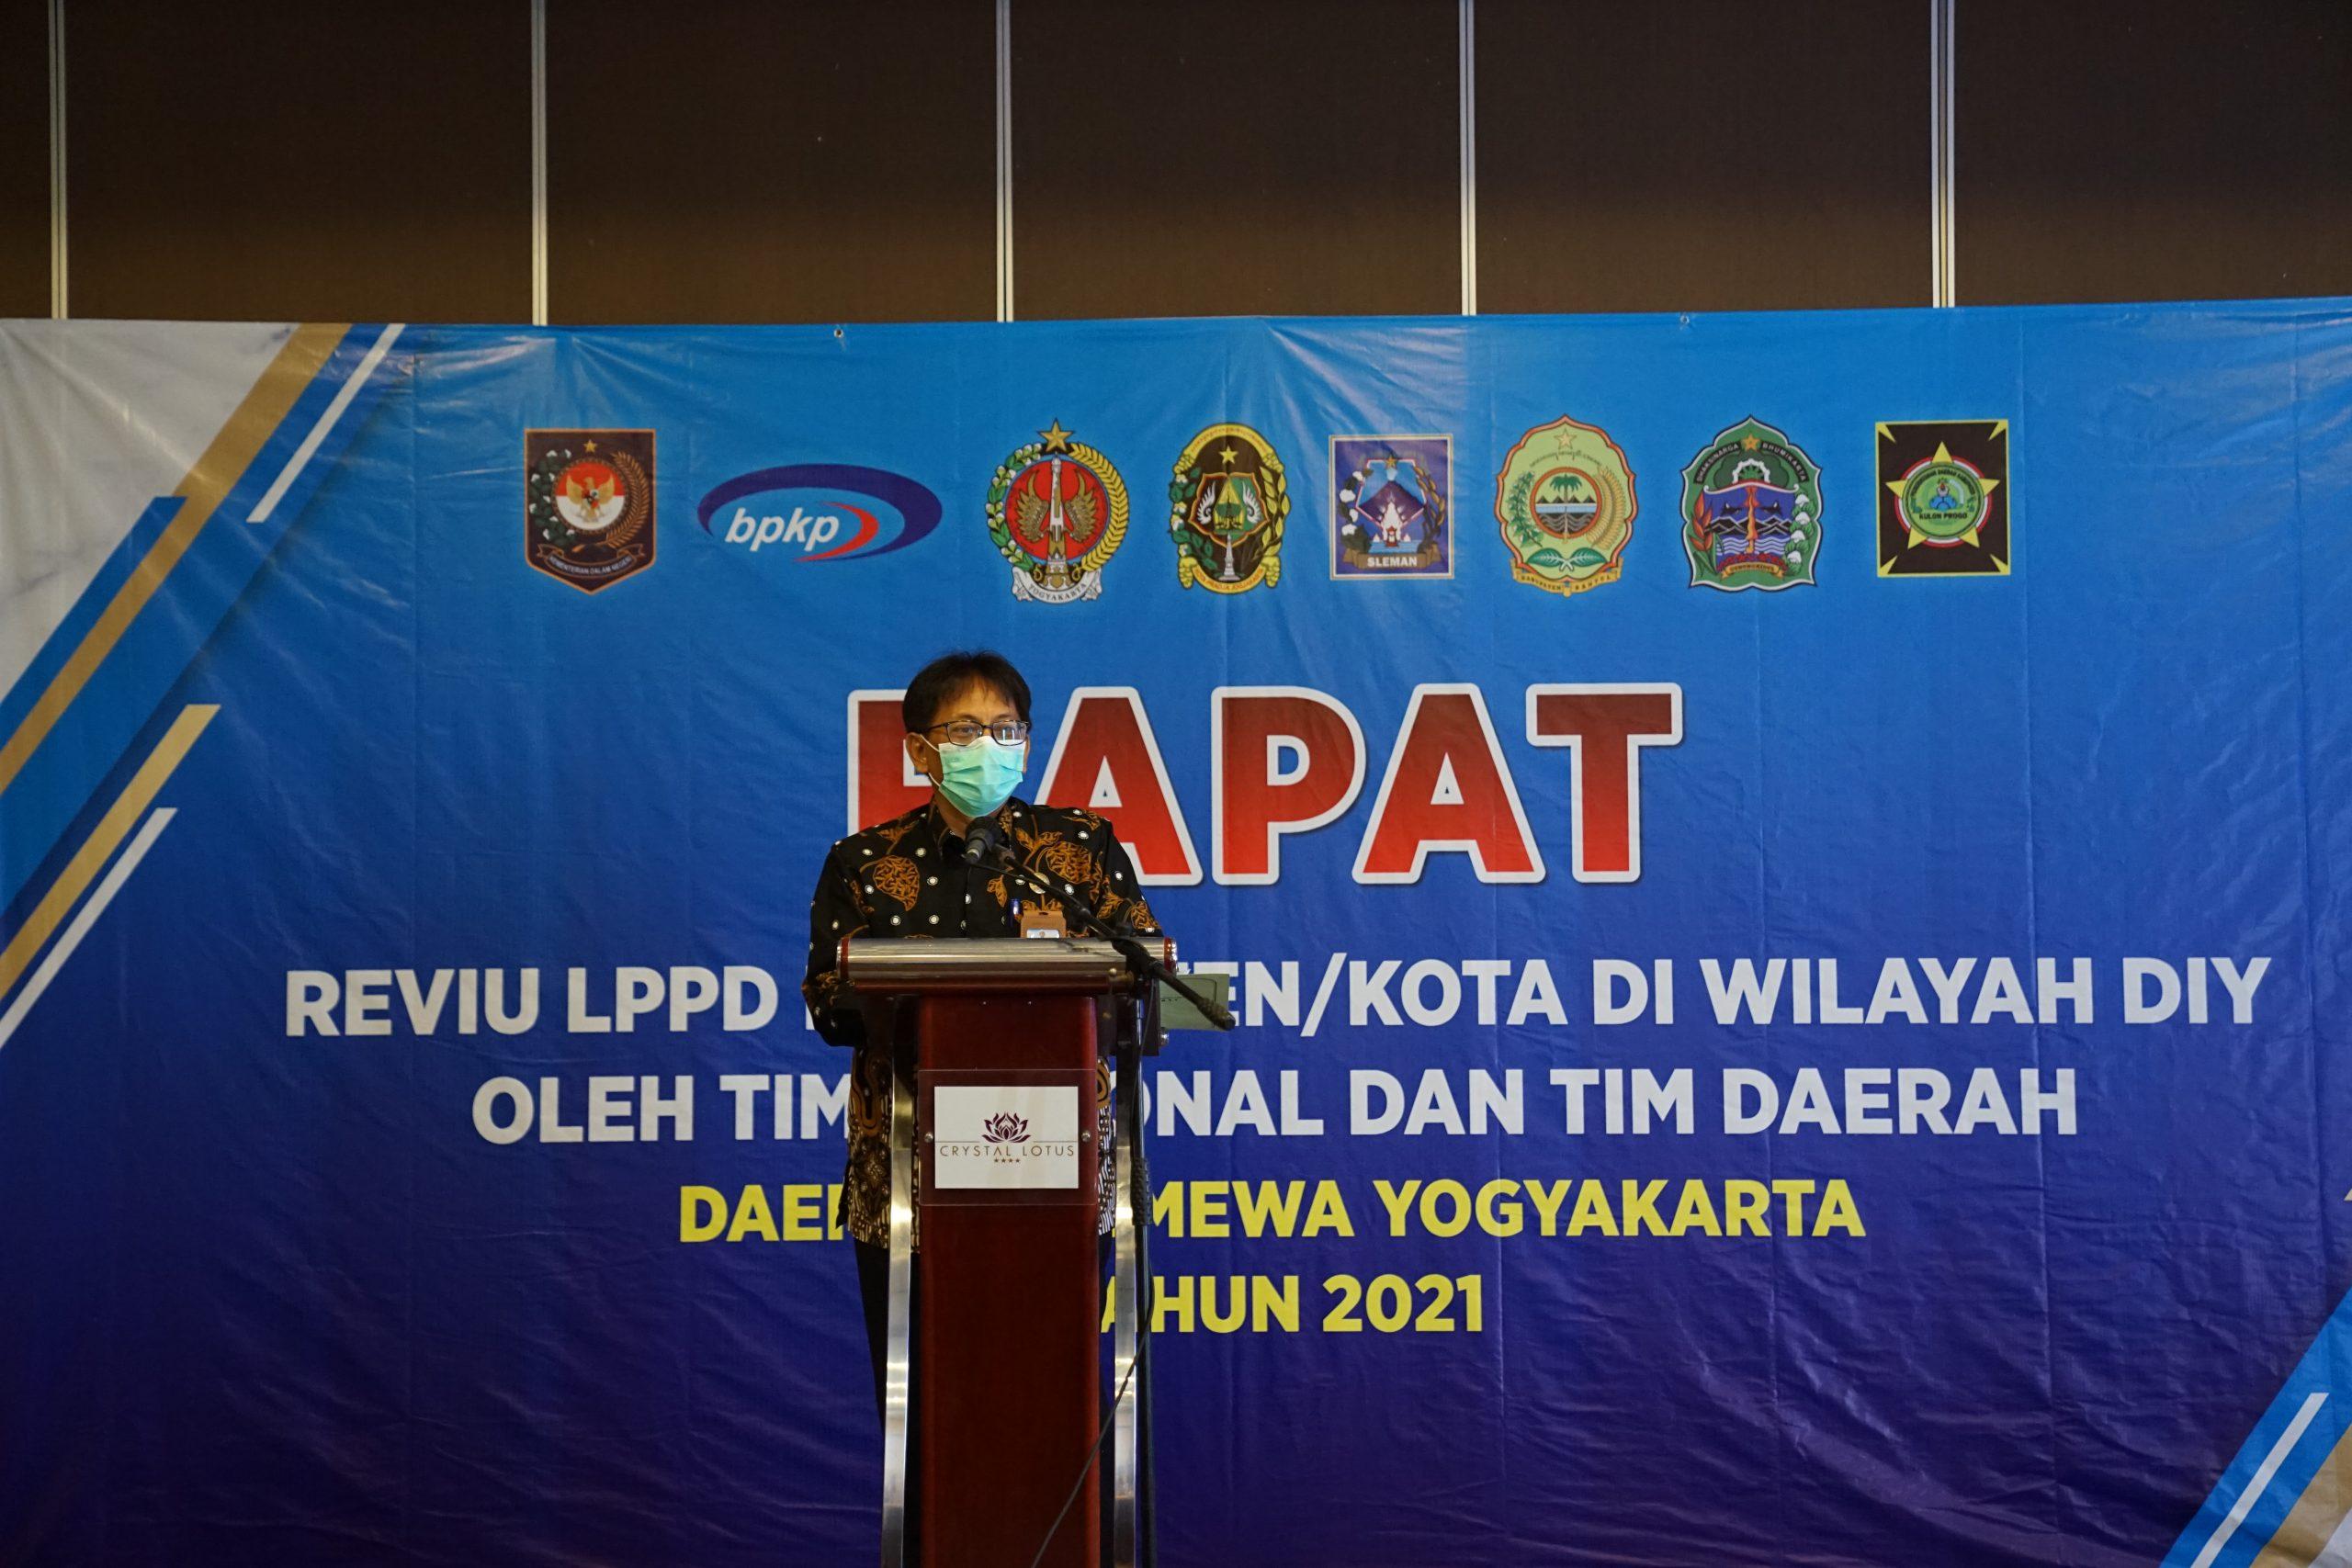 Rapat Reviu LPPD Kabupaten/Kota Daerah Istimewa Yogyakarta